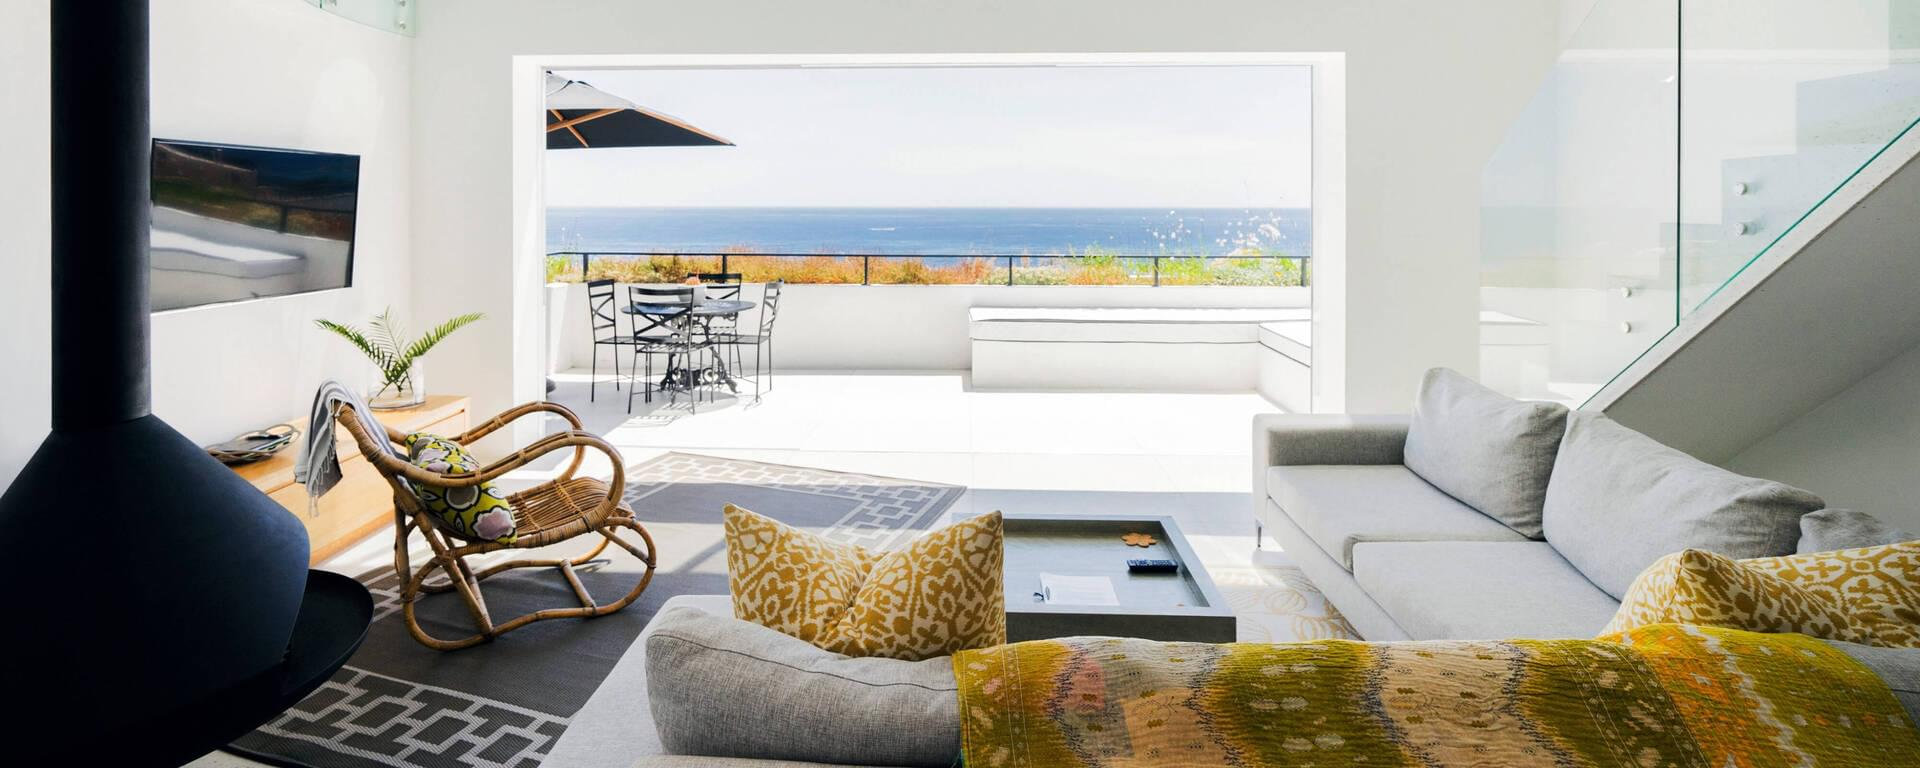 Airbnb Customer Service Story | Zendesk